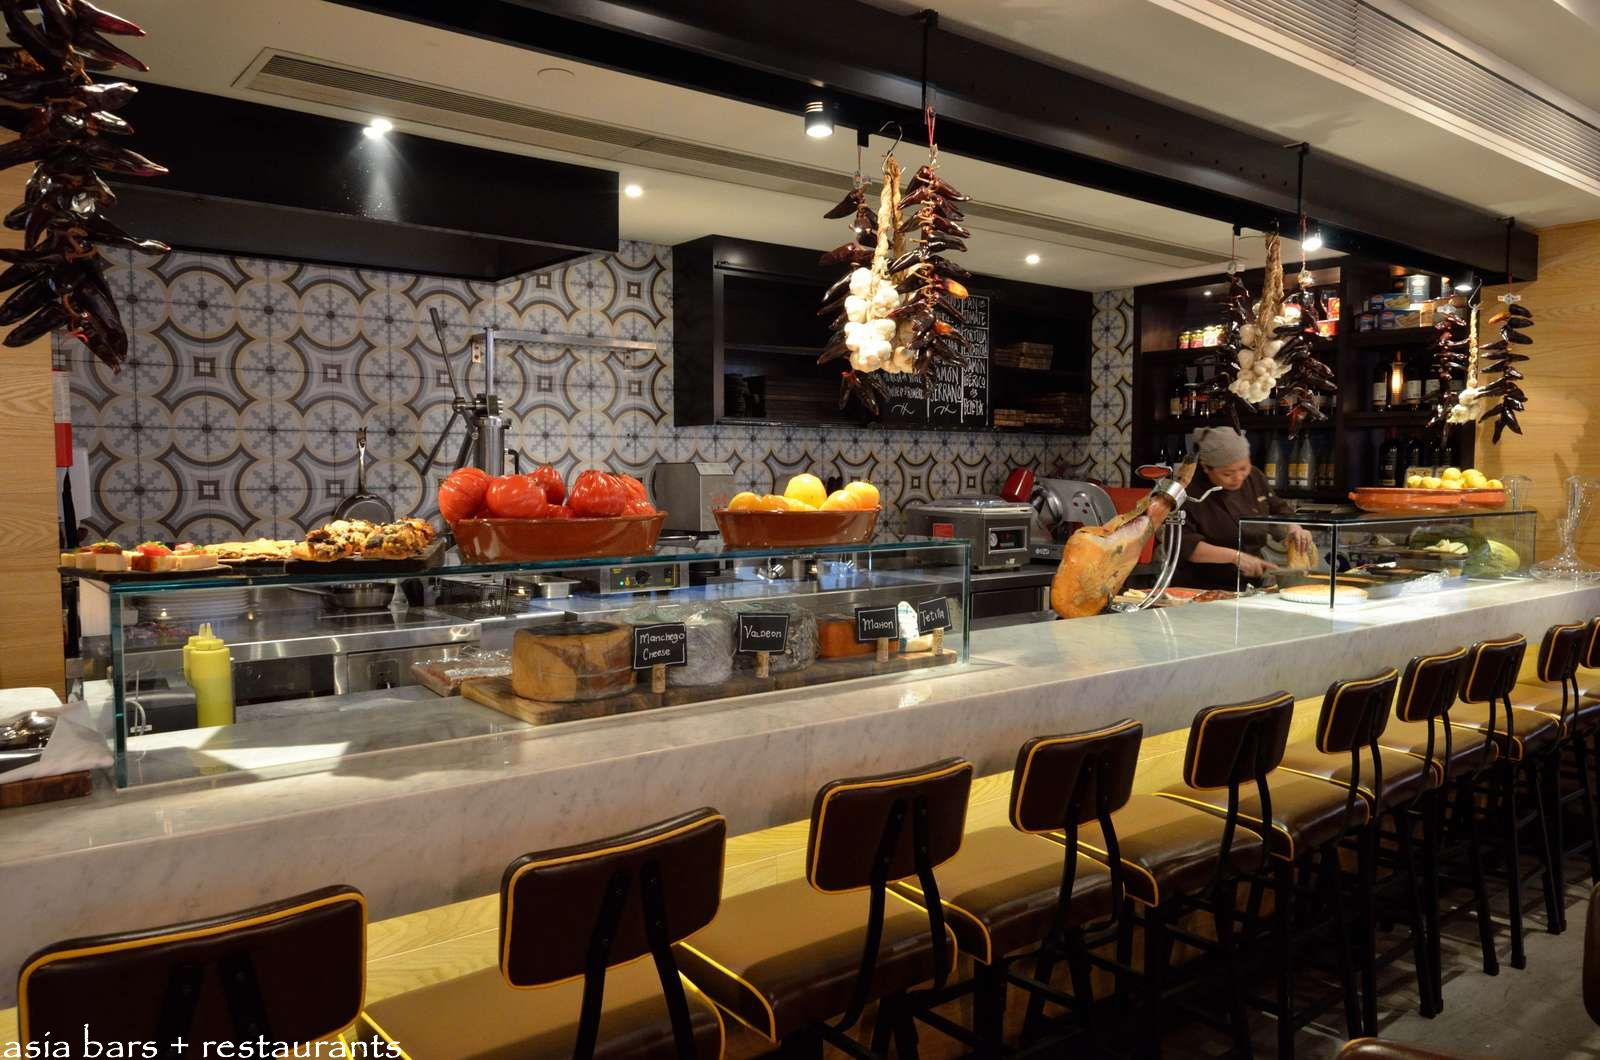 Boqueria Tapas Bar amp Restaurant Hong Kong Asia Bars